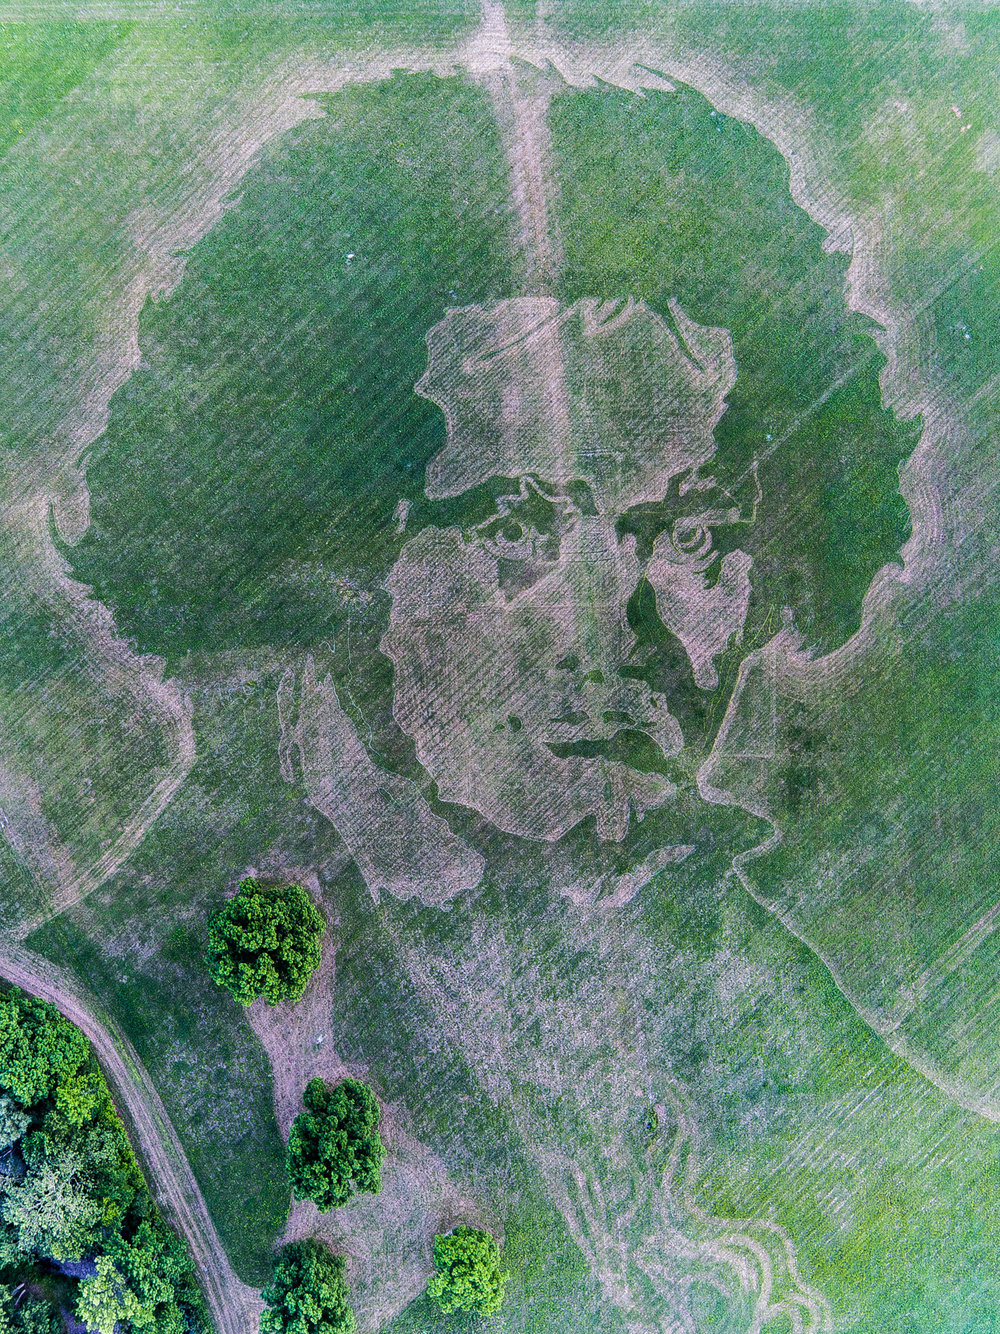 Chase-Guttman-Drone-Portfolio-1.jpg